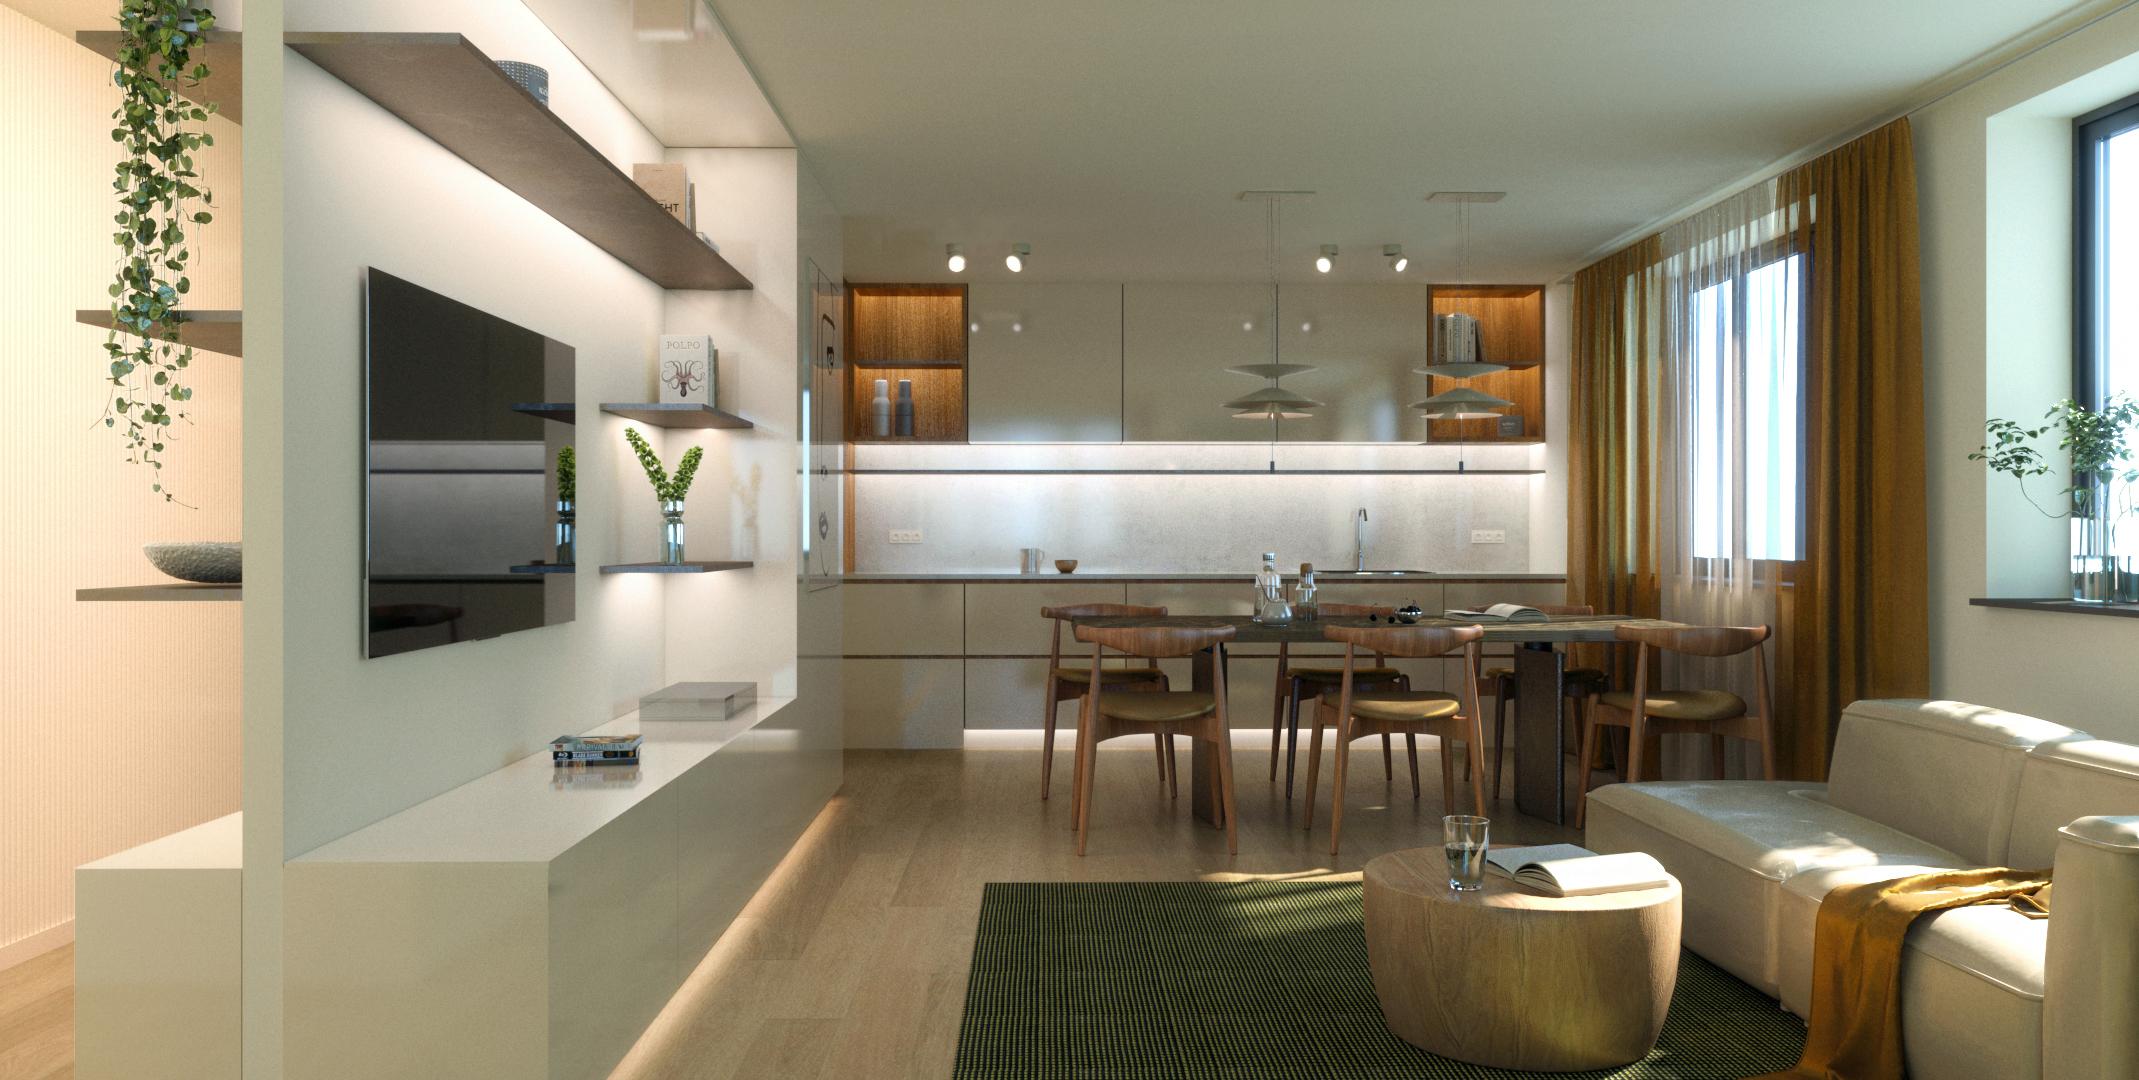 London_Apartment_Gila_Shemie_Zakay_Bre (1).jpg